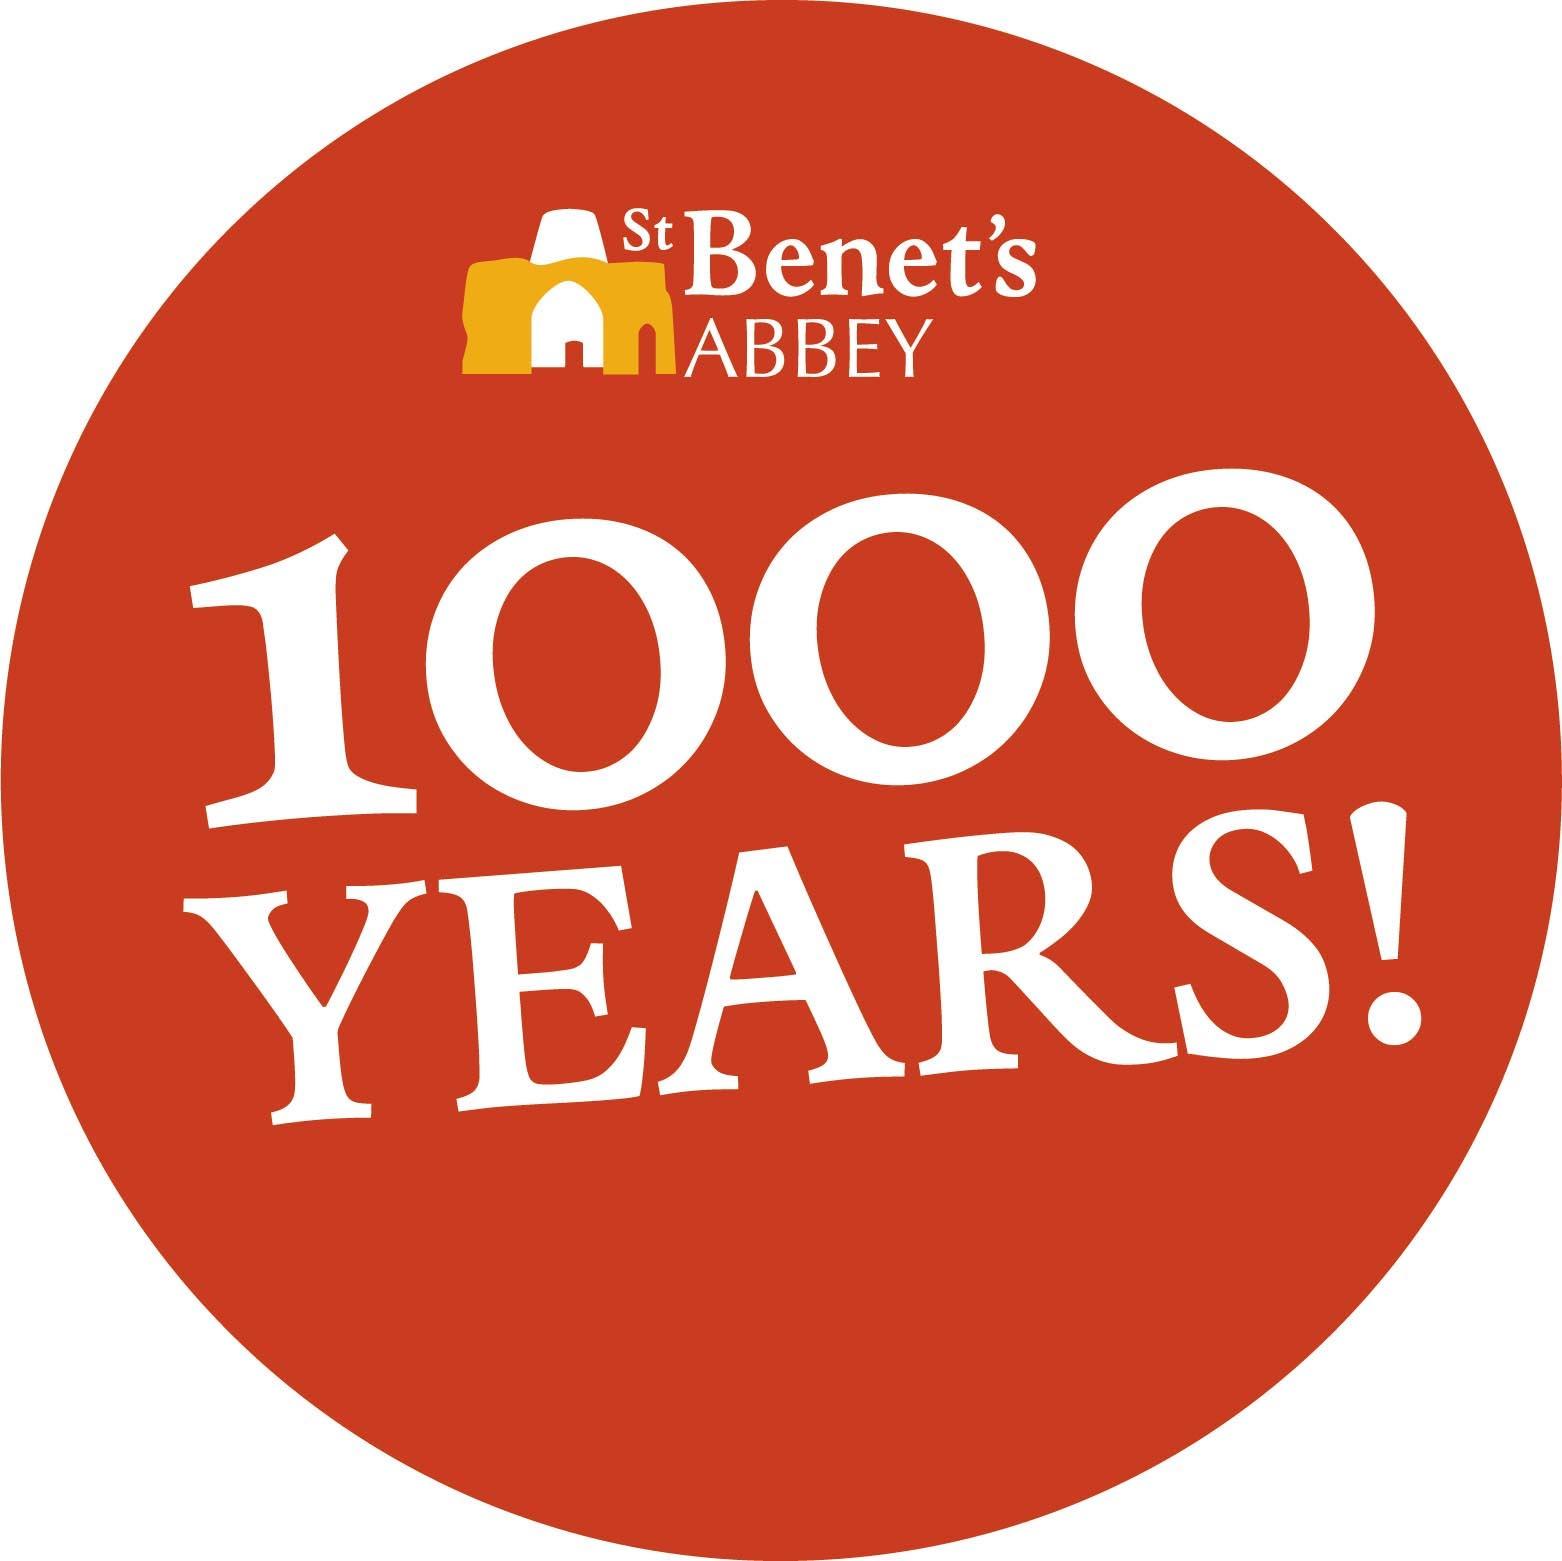 St Benet's 1000 years